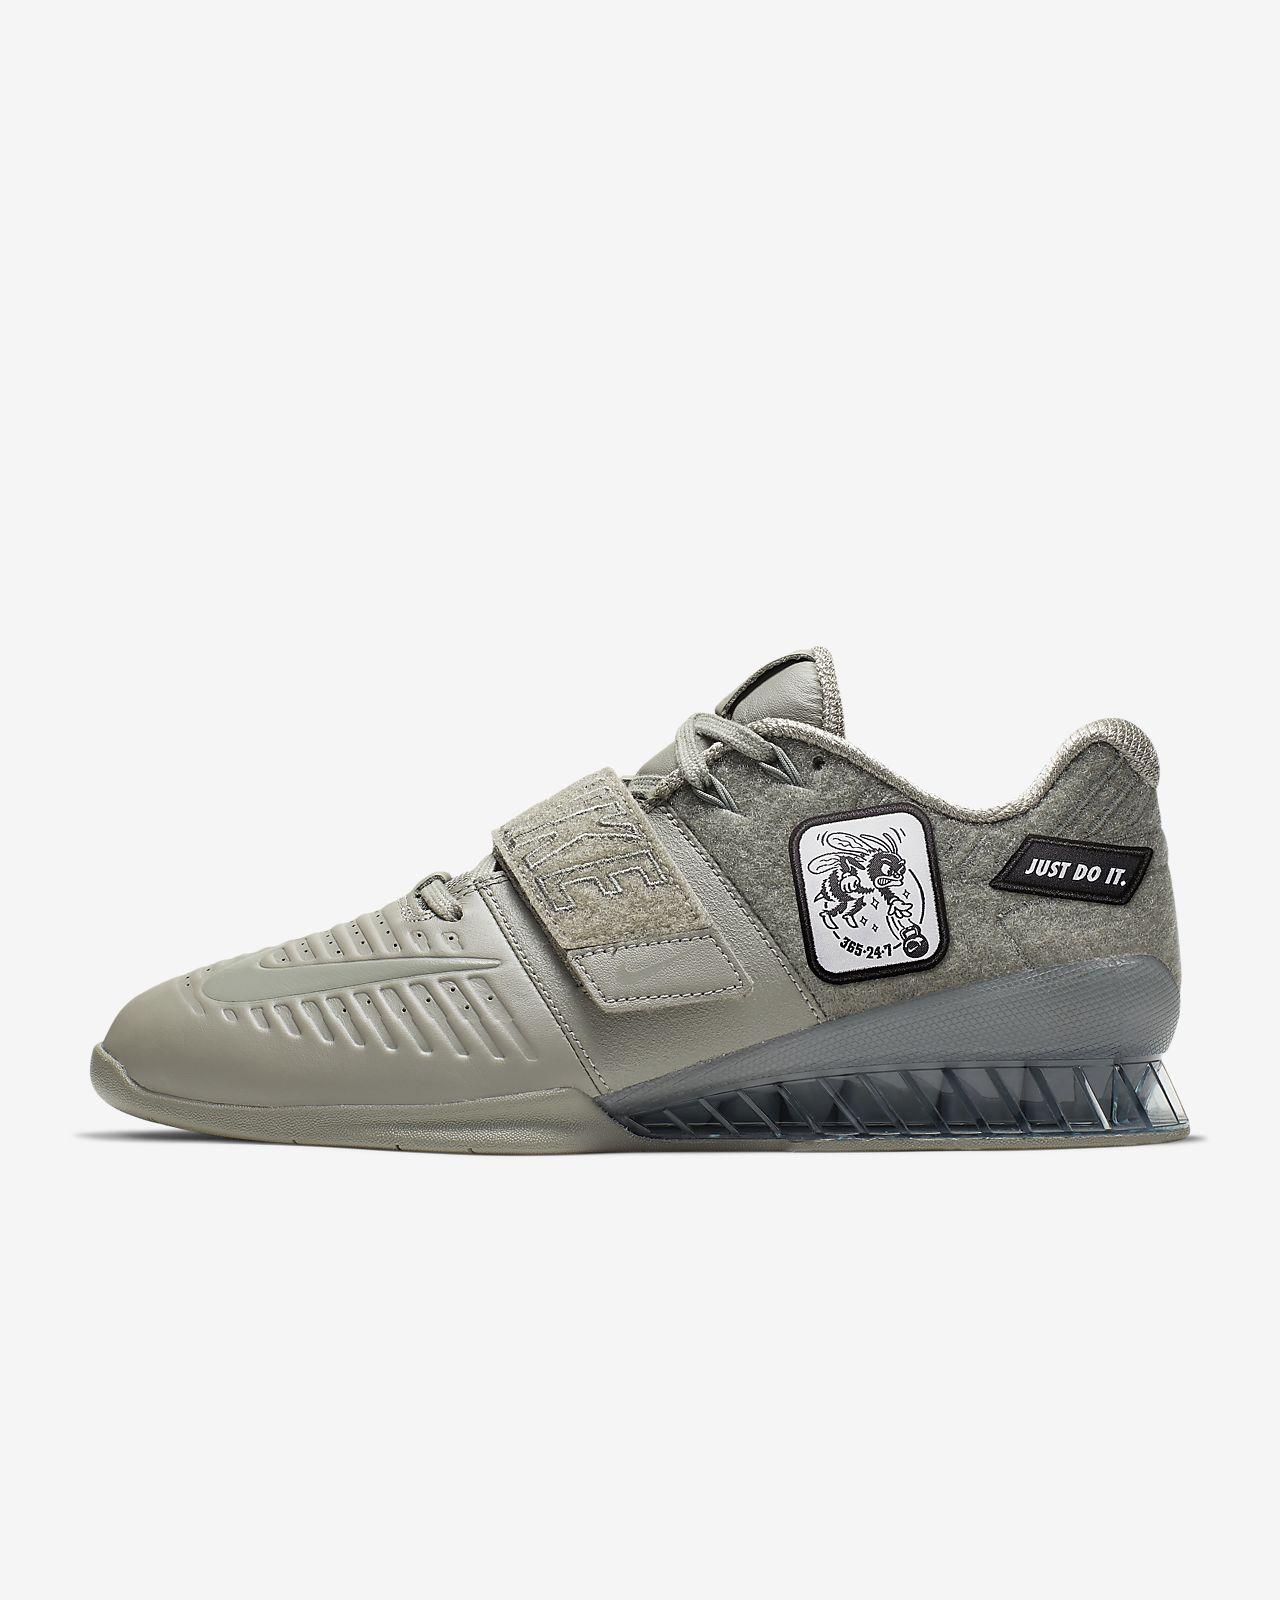 Nike Romaleos 3 XD Patch Trainingsschoen